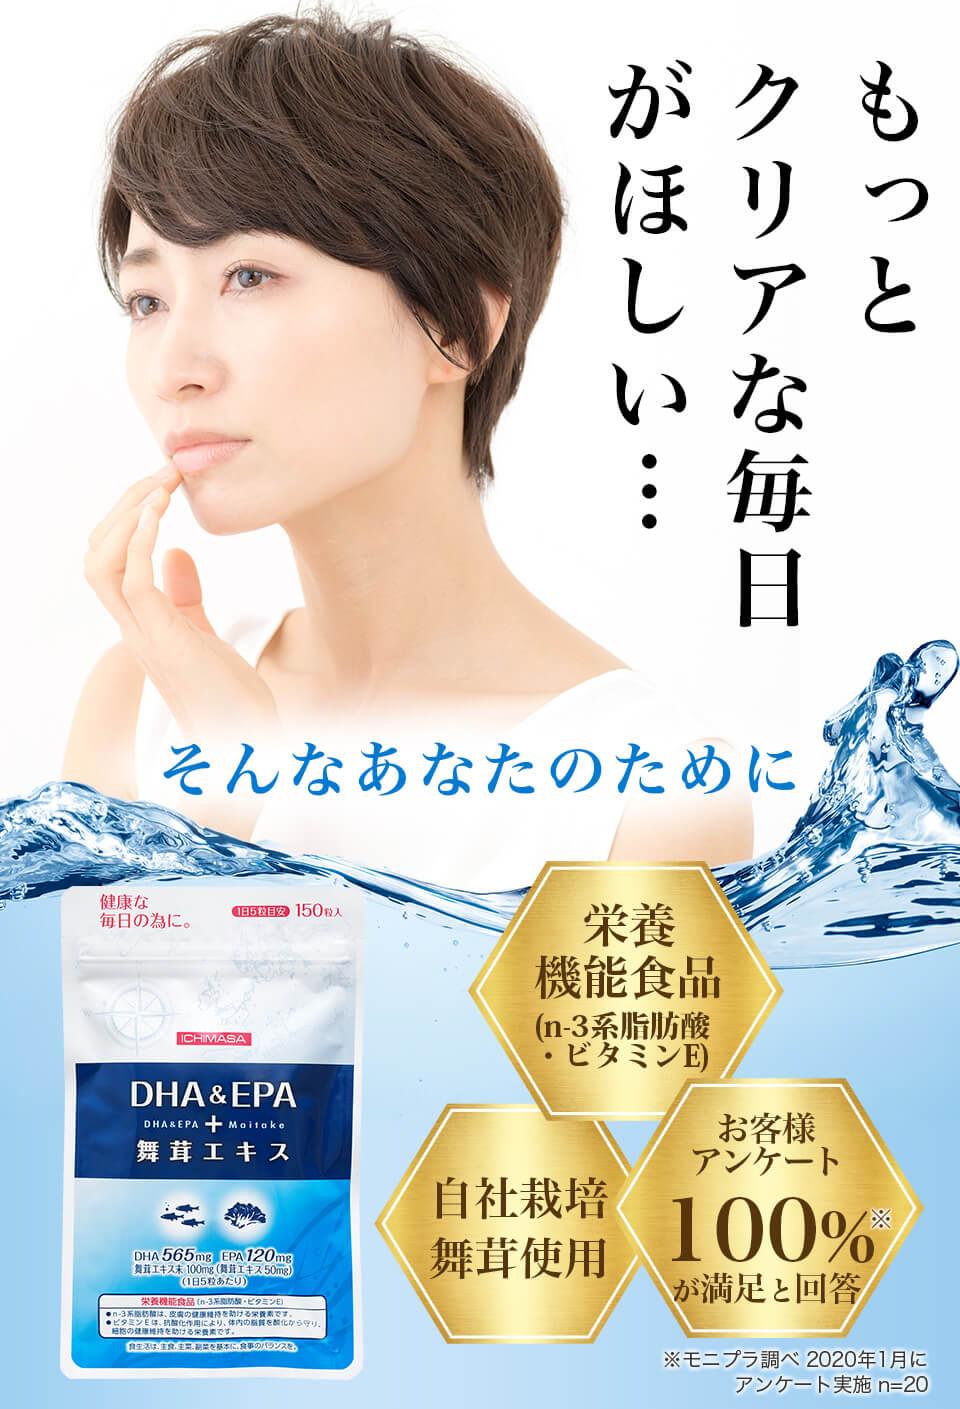 DHA&EPA+舞茸エキス サプリメント n︲3系脂肪酸 ビタミンE お客様 アンケート 100%が満足と回答